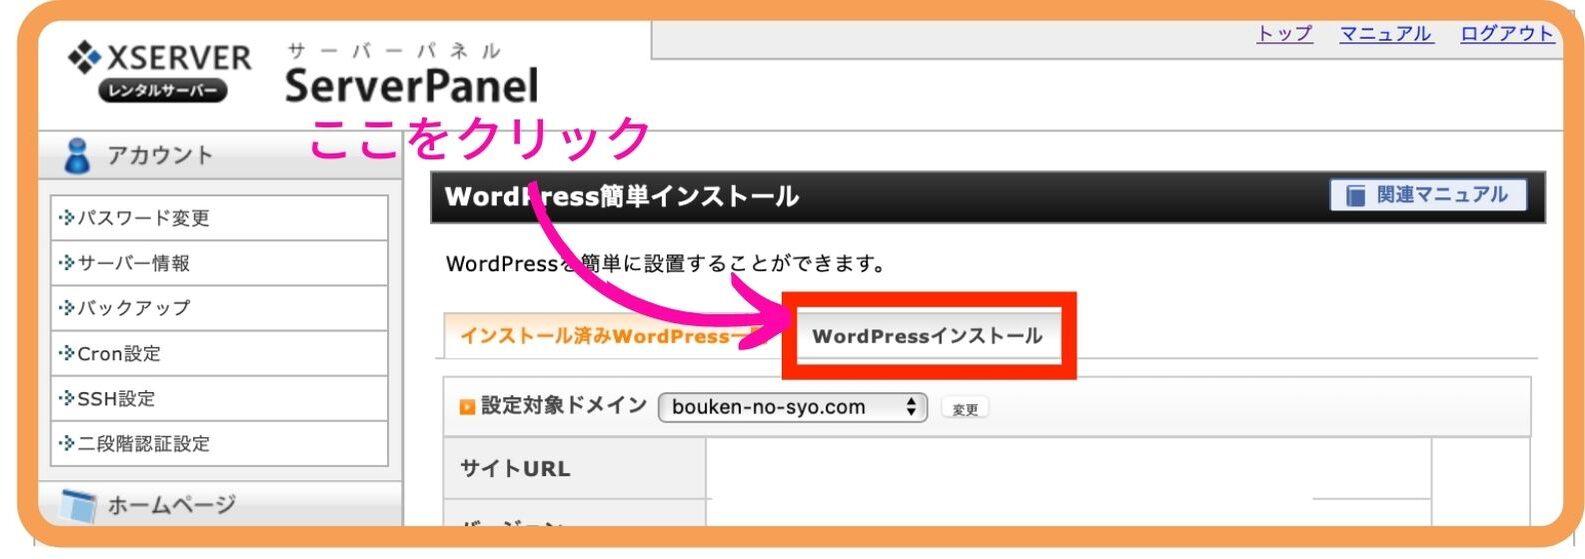 WordPressインストール手順4